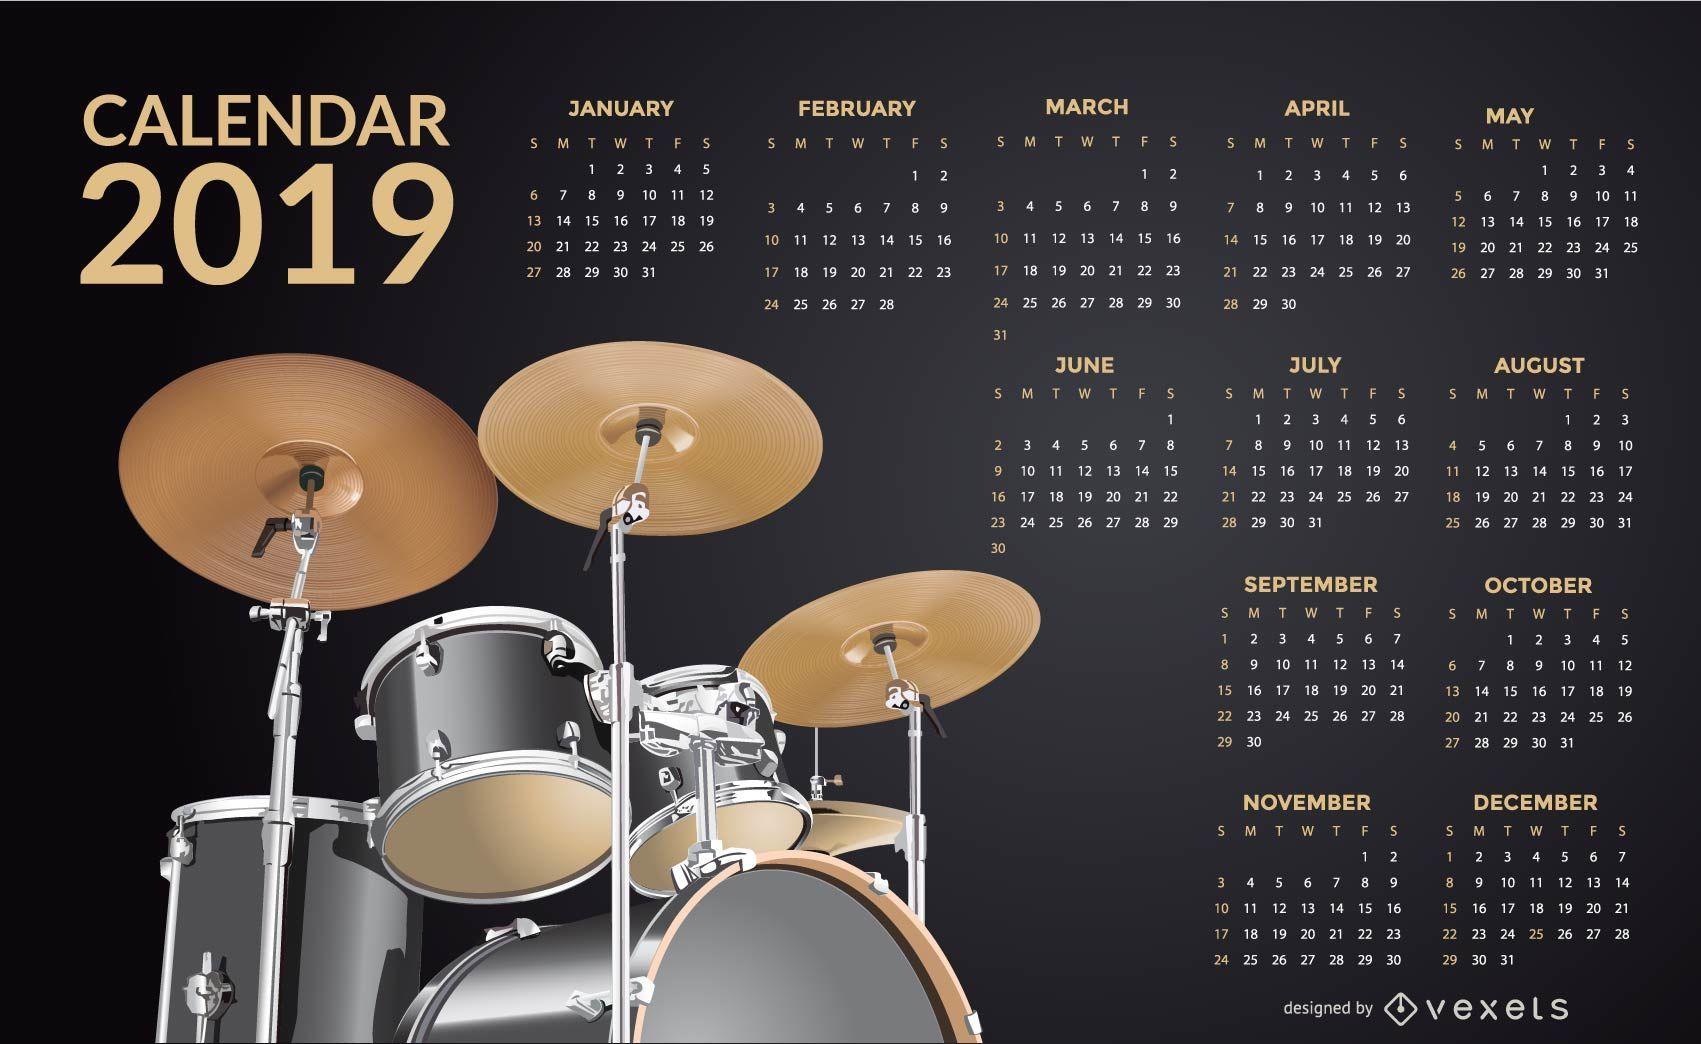 Drums 2019 Calendar Design